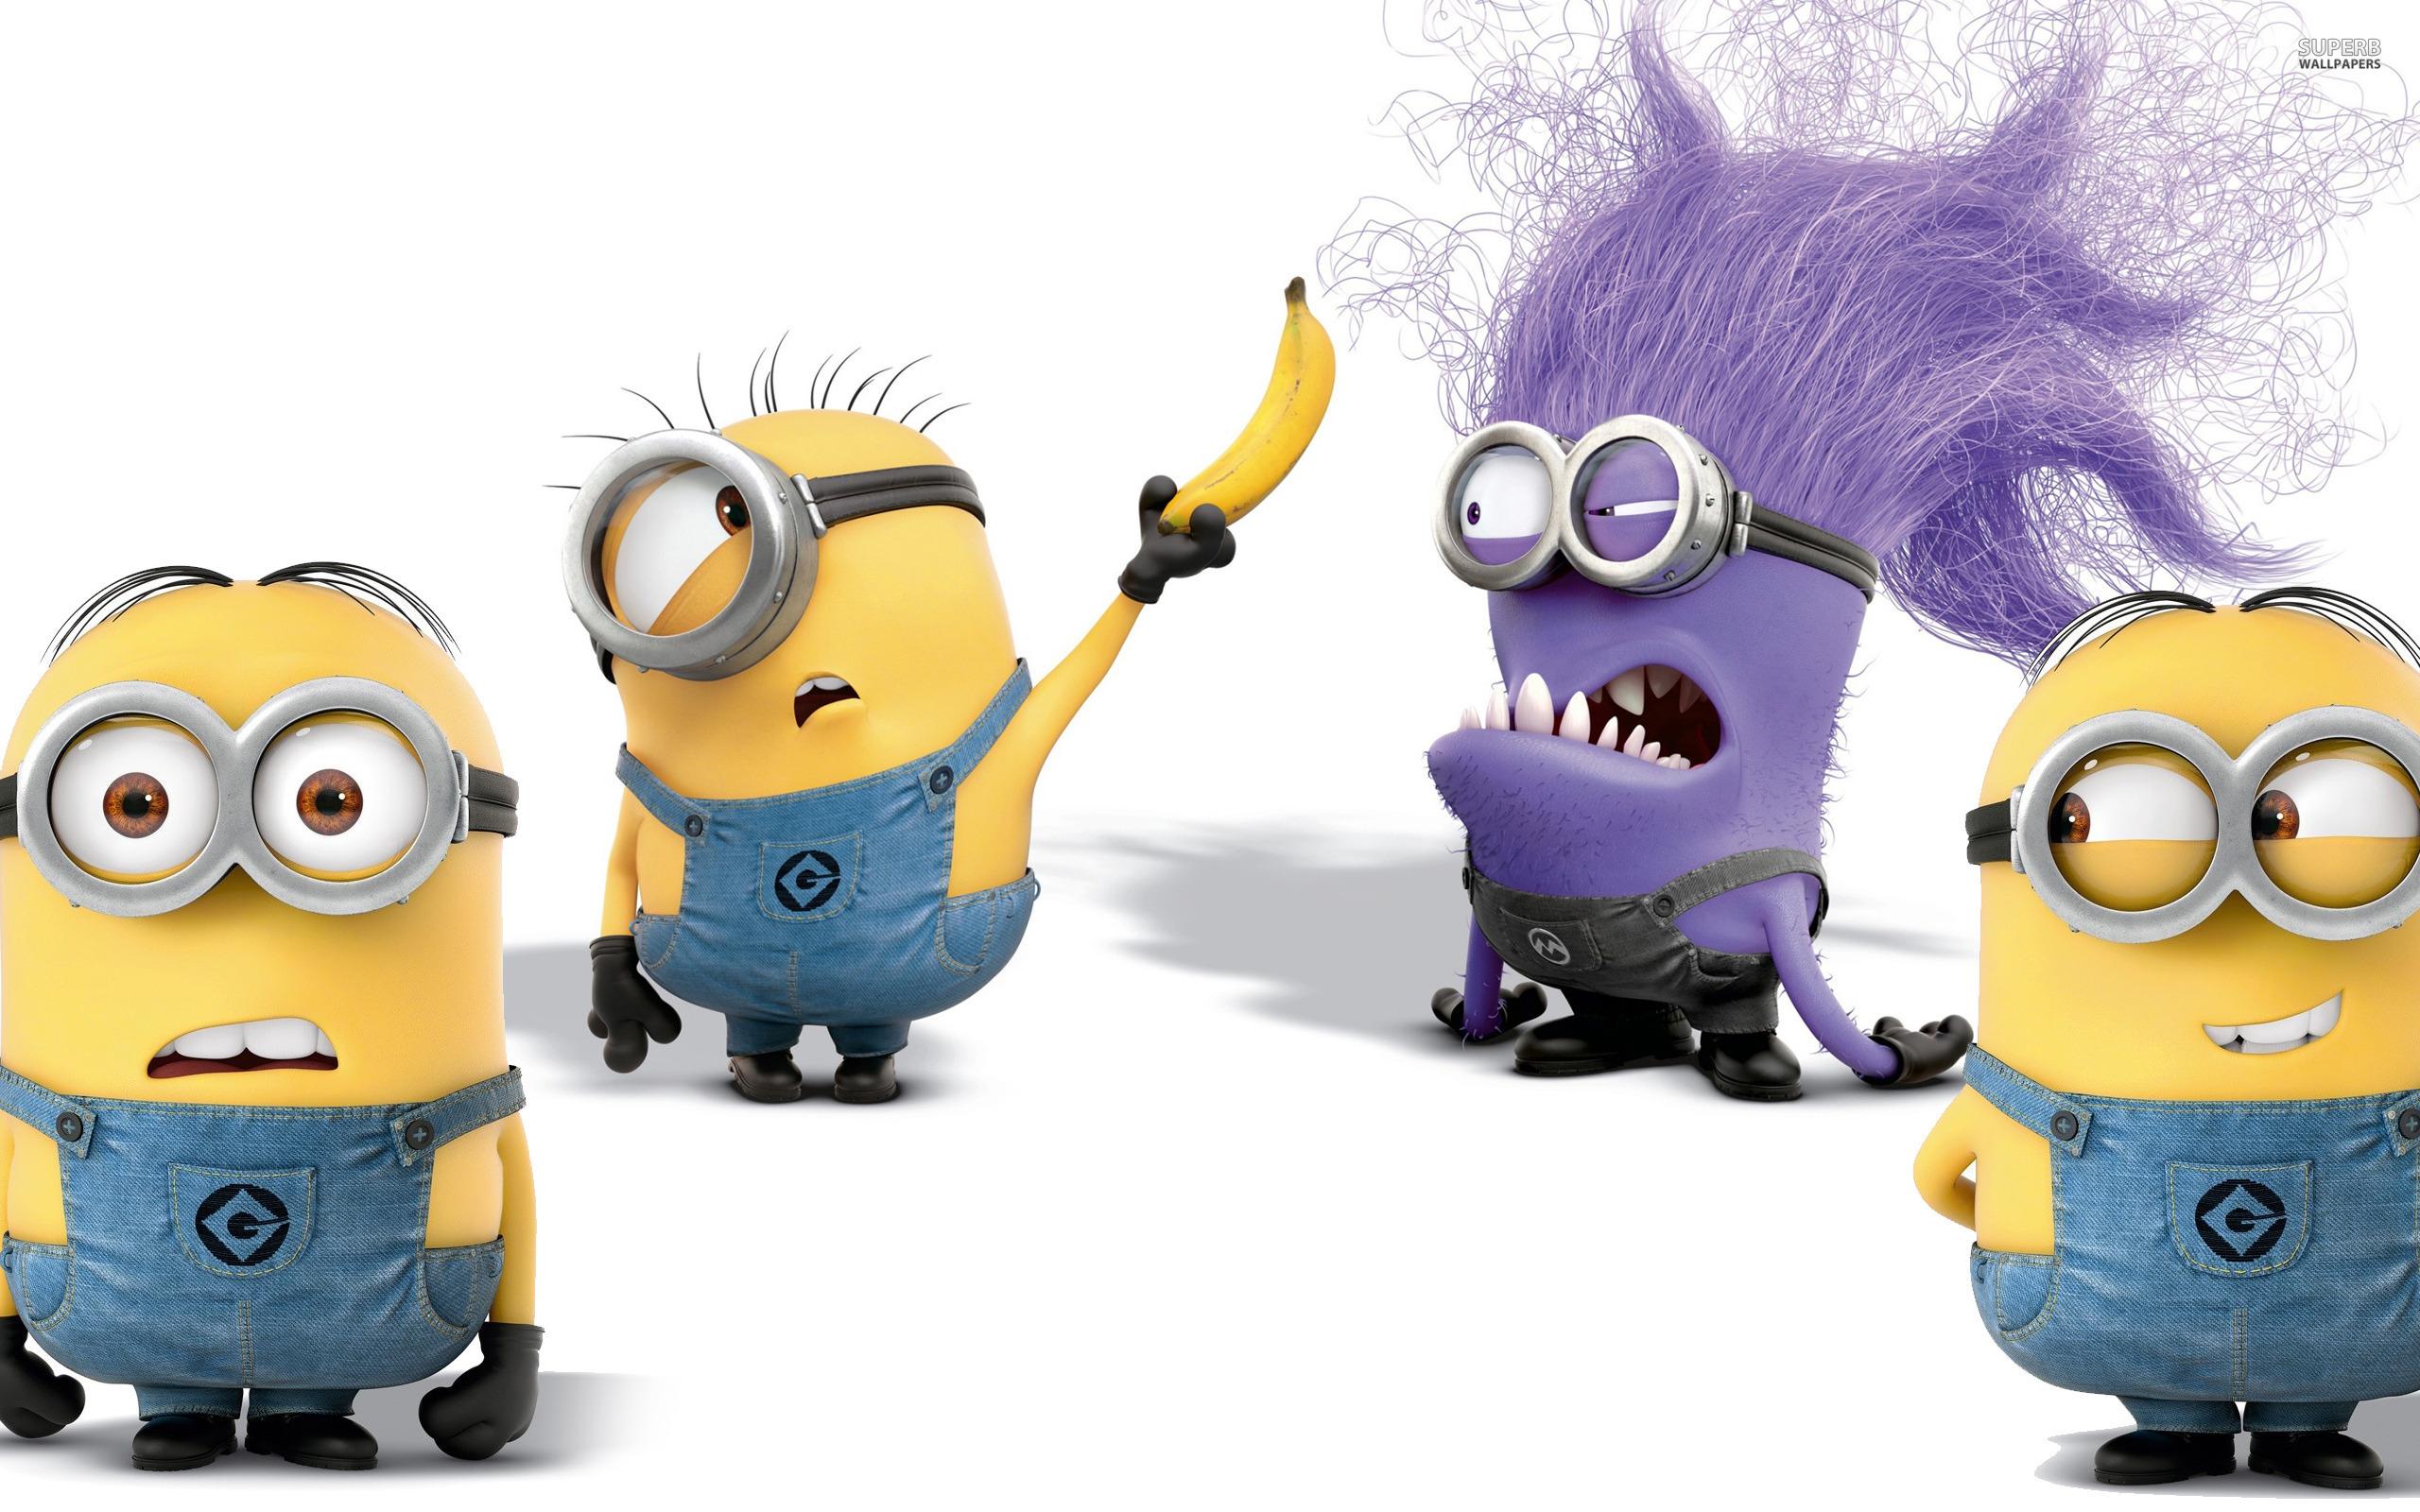 Minions - Despicable Me 2 wallpaper 2560x1600 jpg